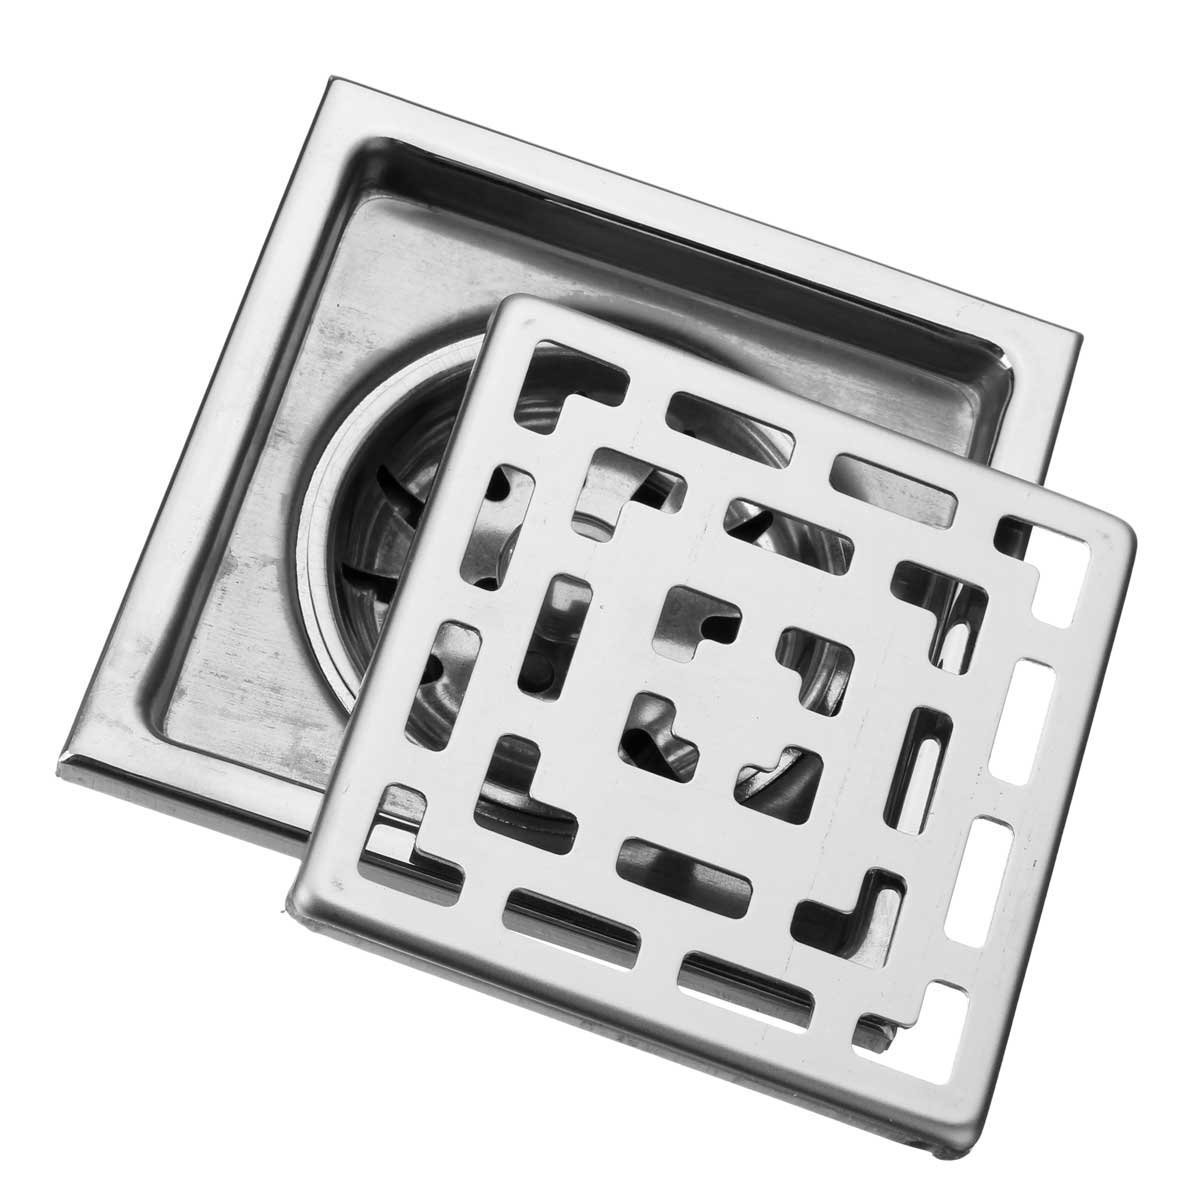 10x10cm Three Layers Square Stainless Steel Bathroom Floor Drain Water Strainer Fliter / : . 10x10cm Three Layers Square Stainless Steel Bathroom Floor Drain Water Strainer Fliter . . This flo